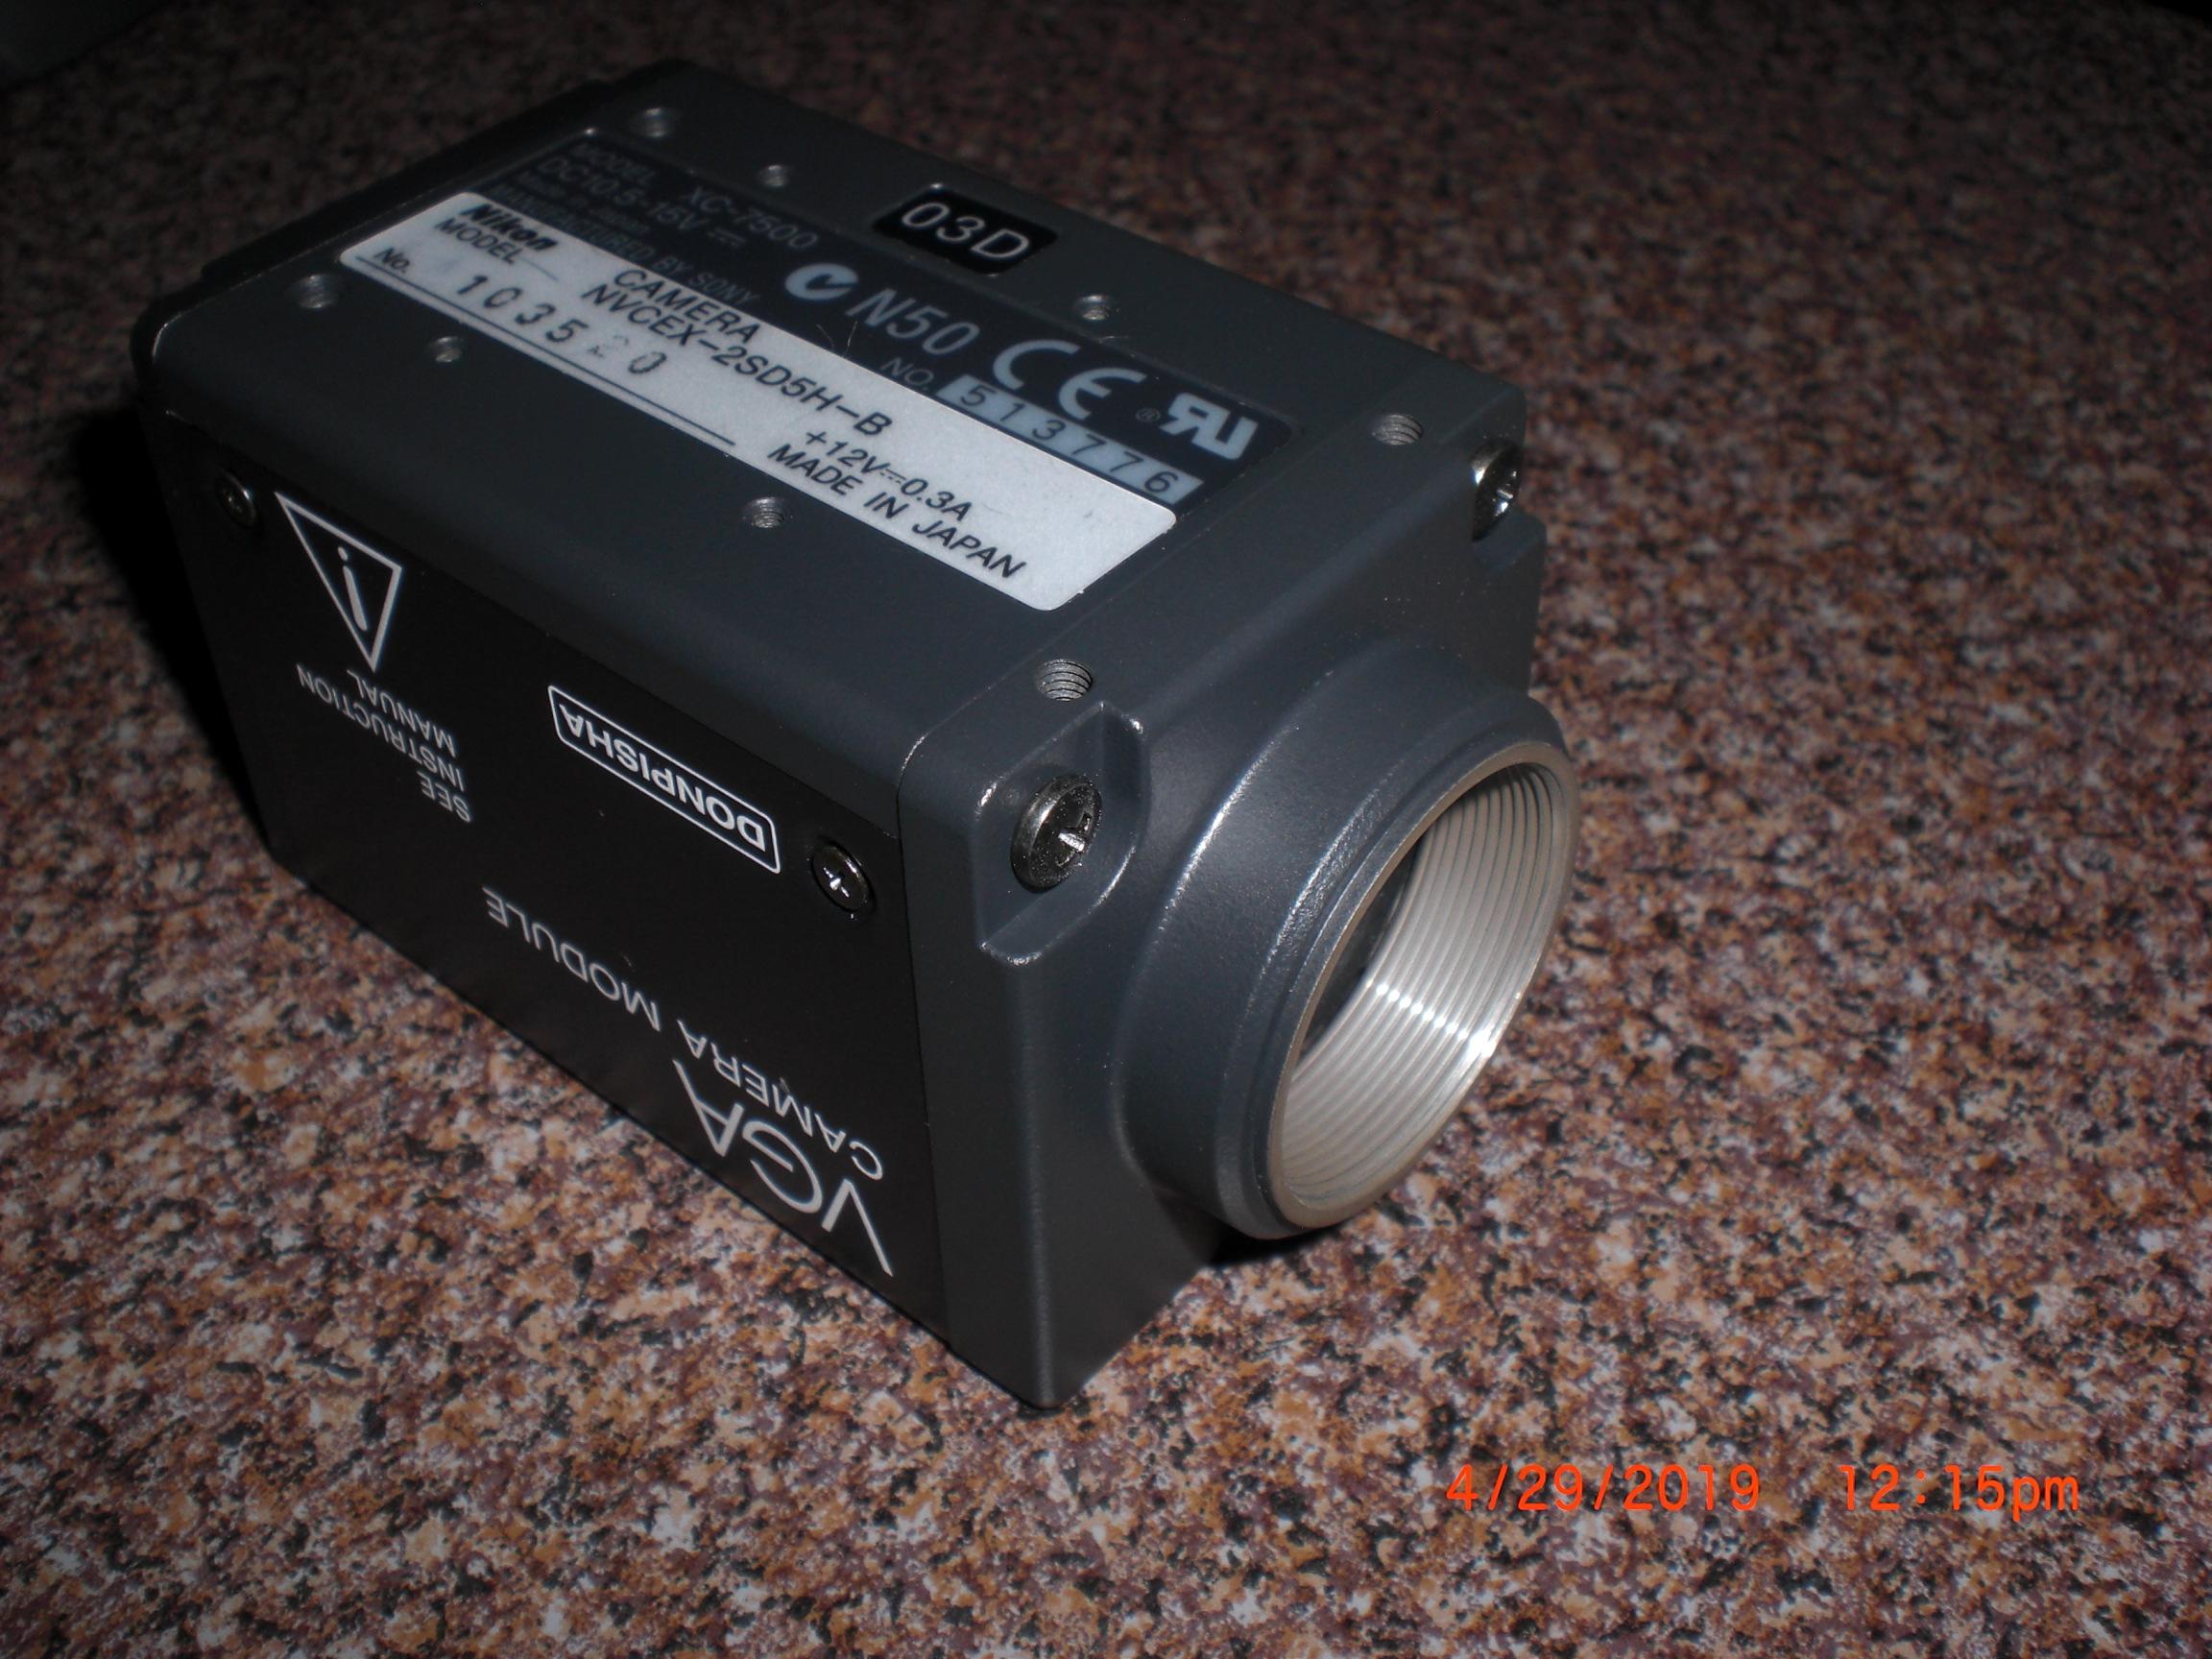 Camera SONY XC-7500 Nikon Model NVCEX-2SD5H-B